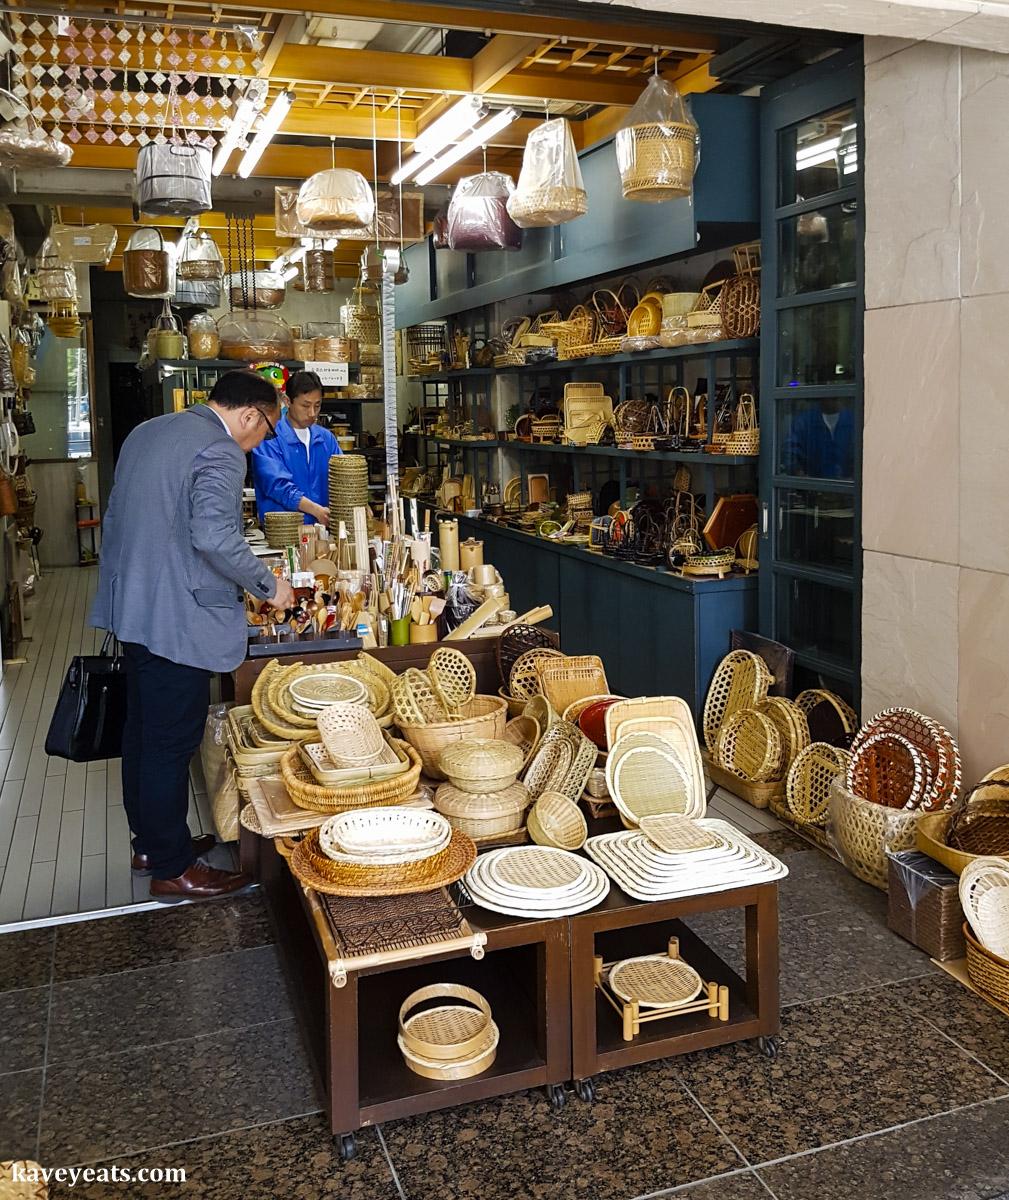 Kitchenware Shopping in Kappabashi Dori, Tokyo